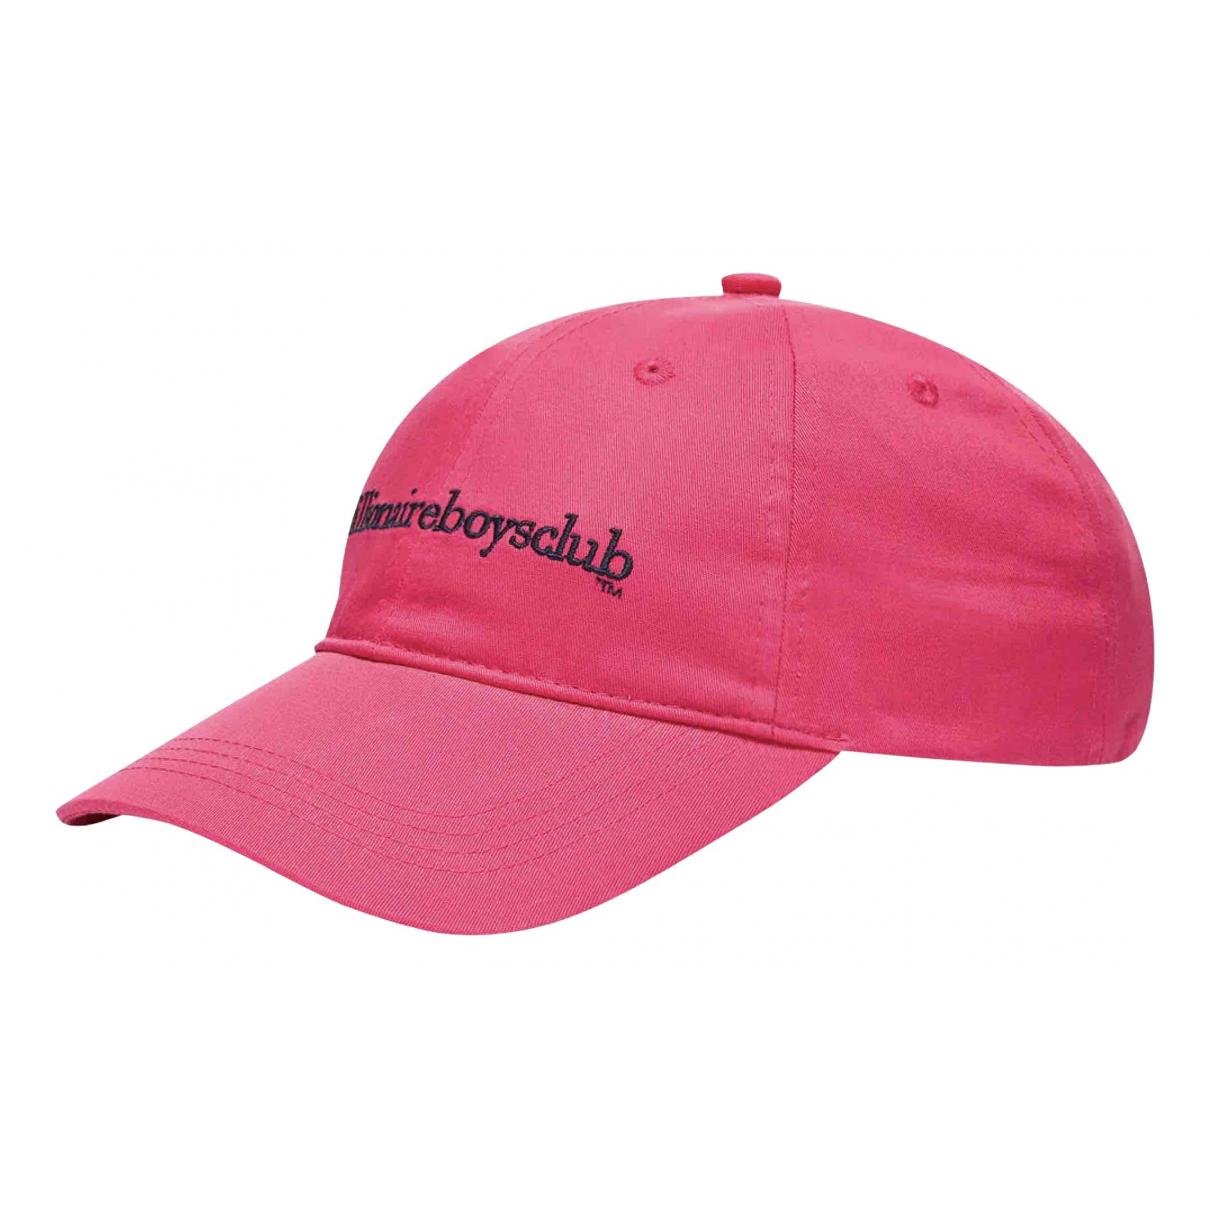 Sombrero / gorro Billionaire Boys Club